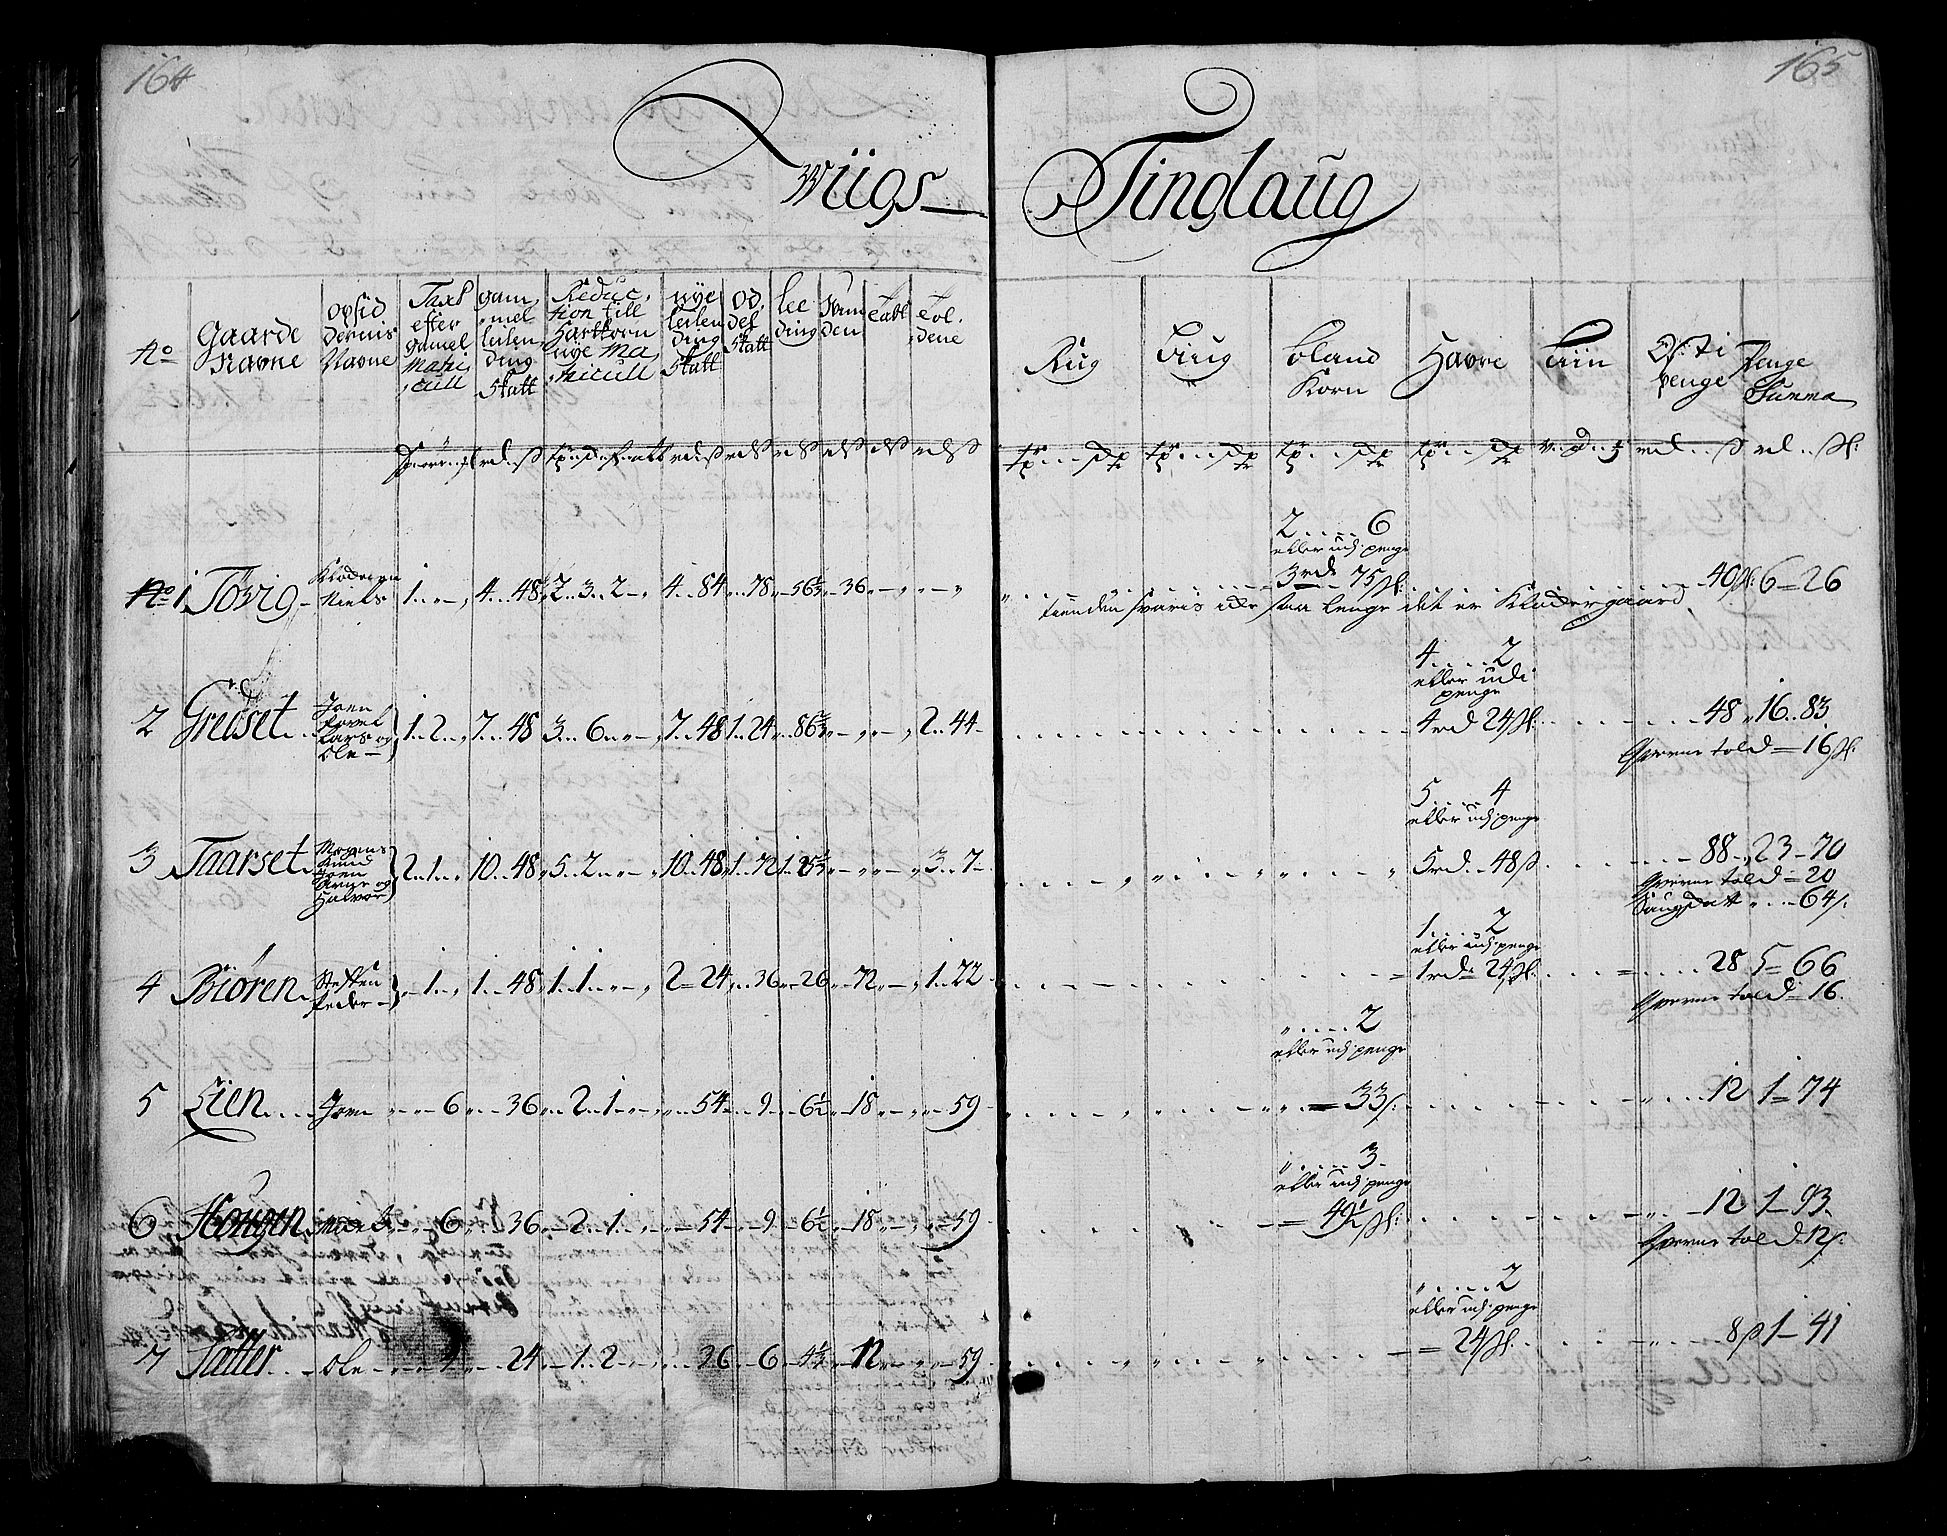 RA, Rentekammeret inntil 1814, Realistisk ordnet avdeling, N/Nb/Nbf/L0155: Nordmøre matrikkelprotokoll, 1721-1723, s. 164-165